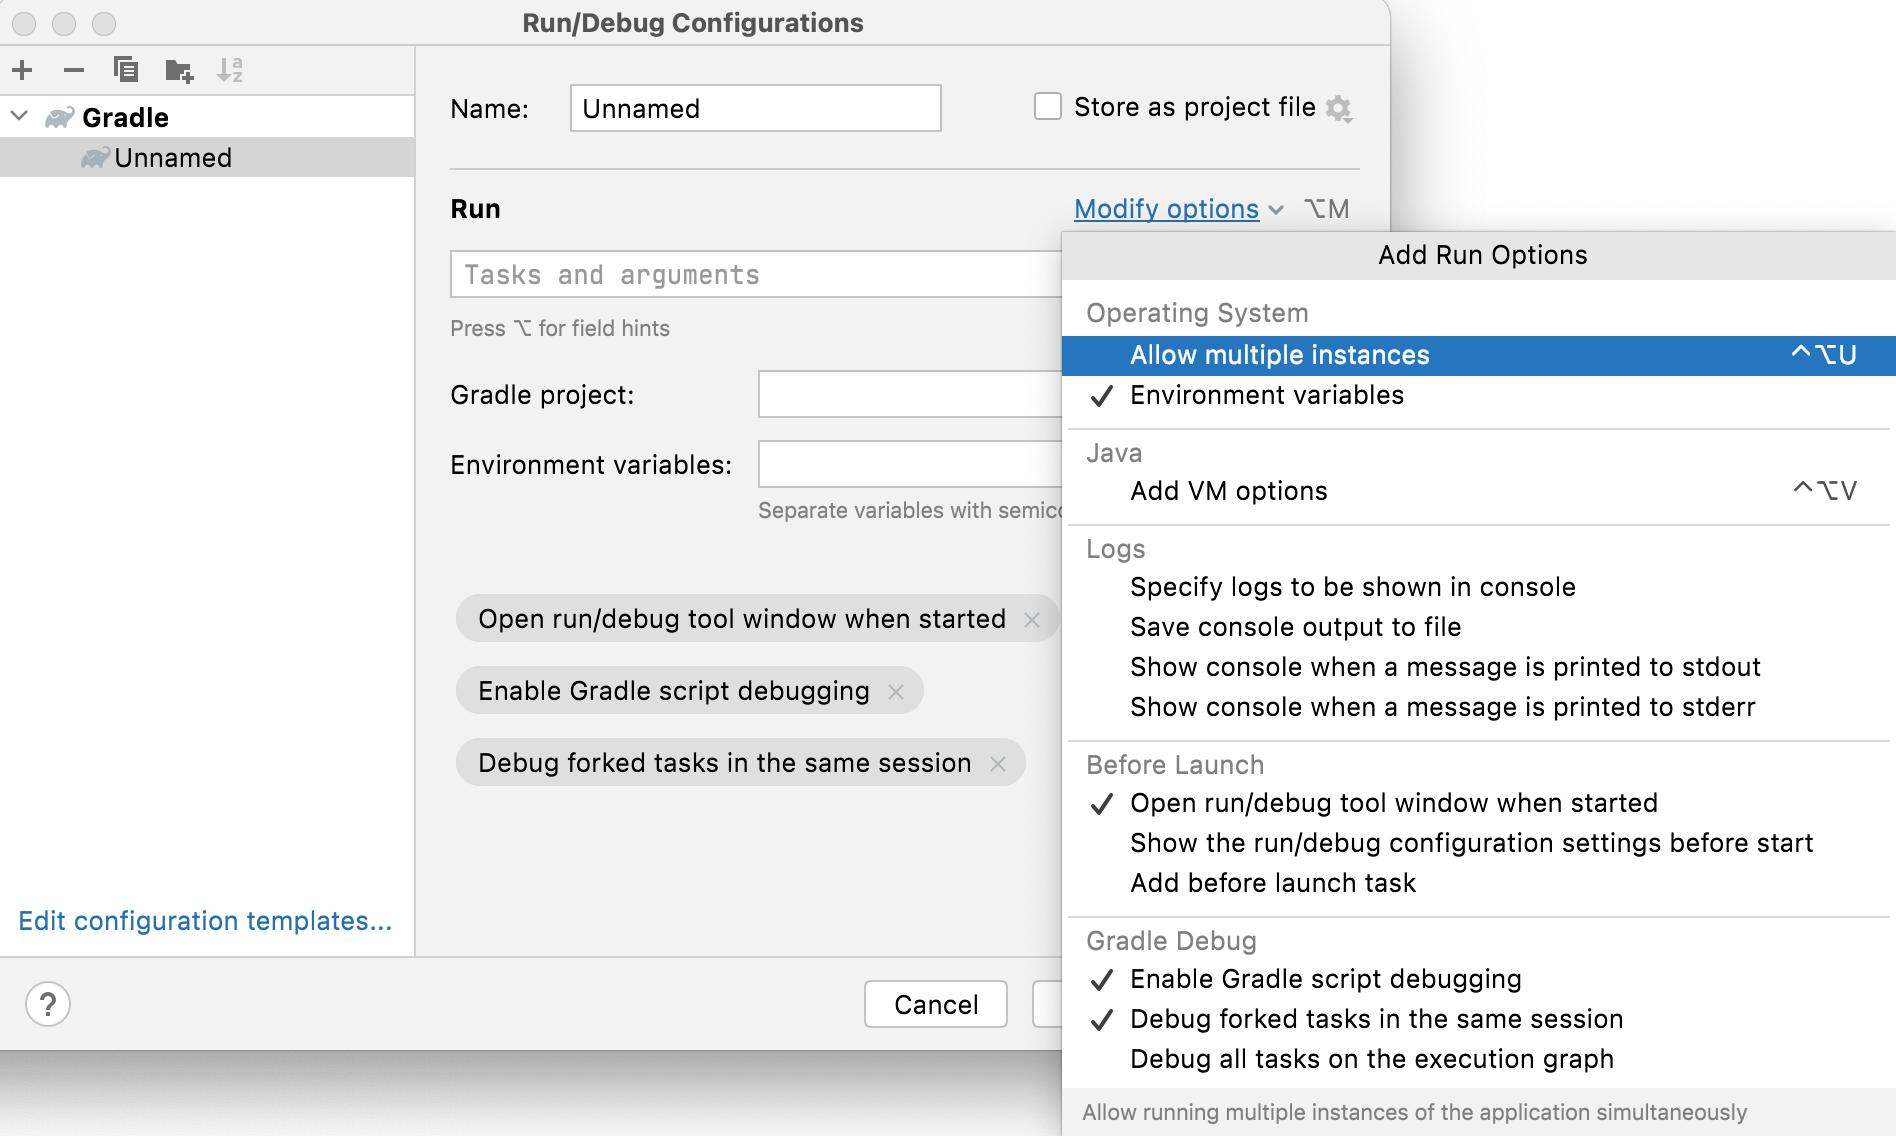 Gradle configuration settings